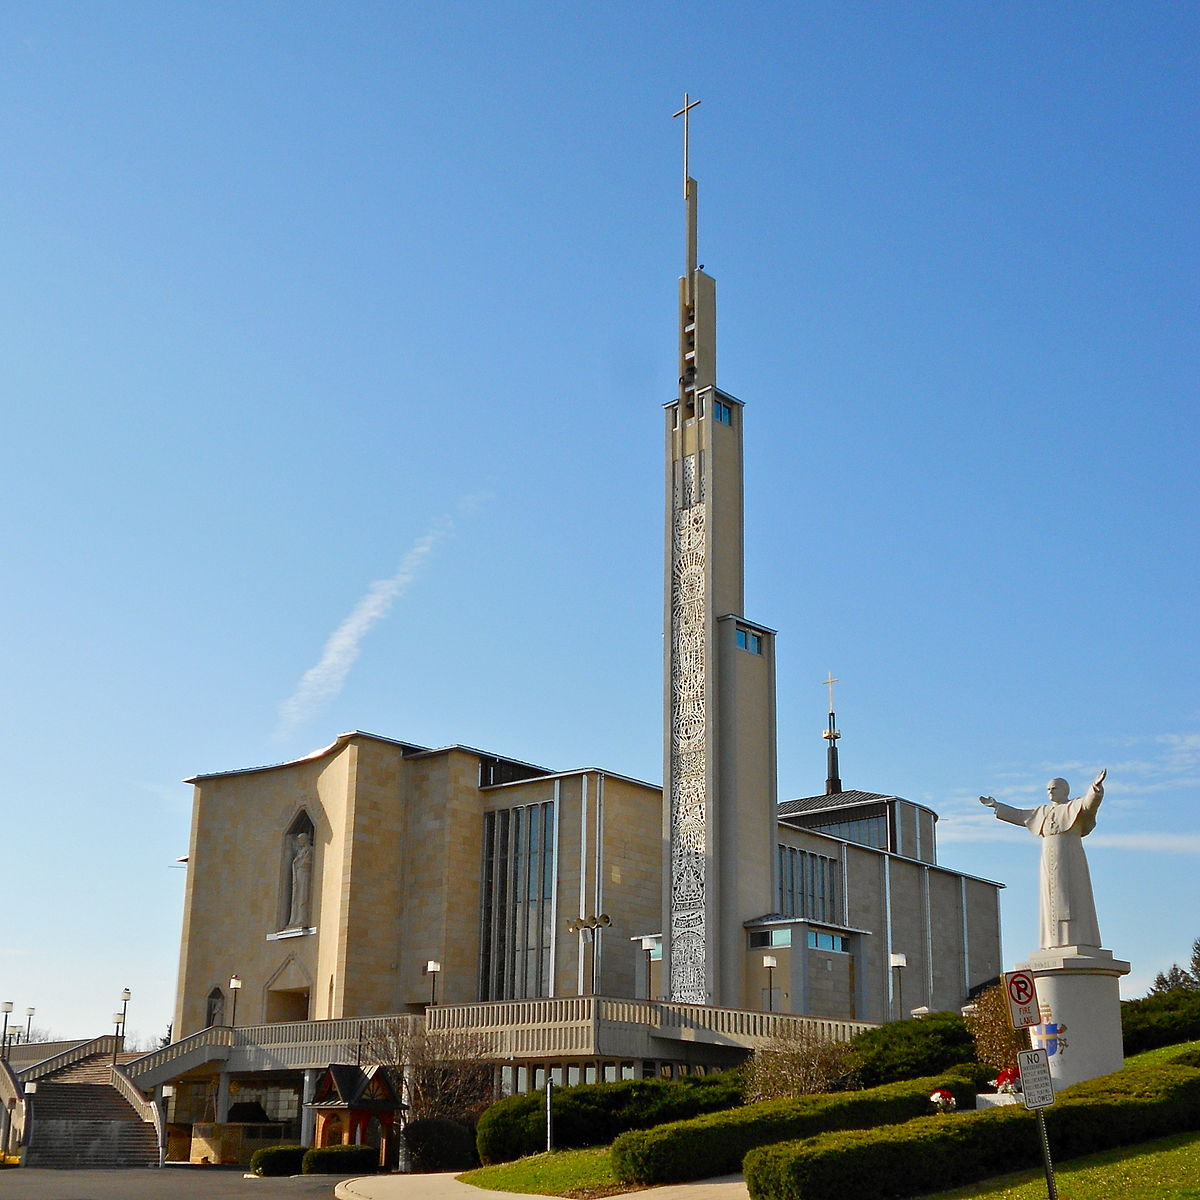 National Shrine of Our Lady of Czestochowa  Photo by Smallbones/CCA-SA 1.0